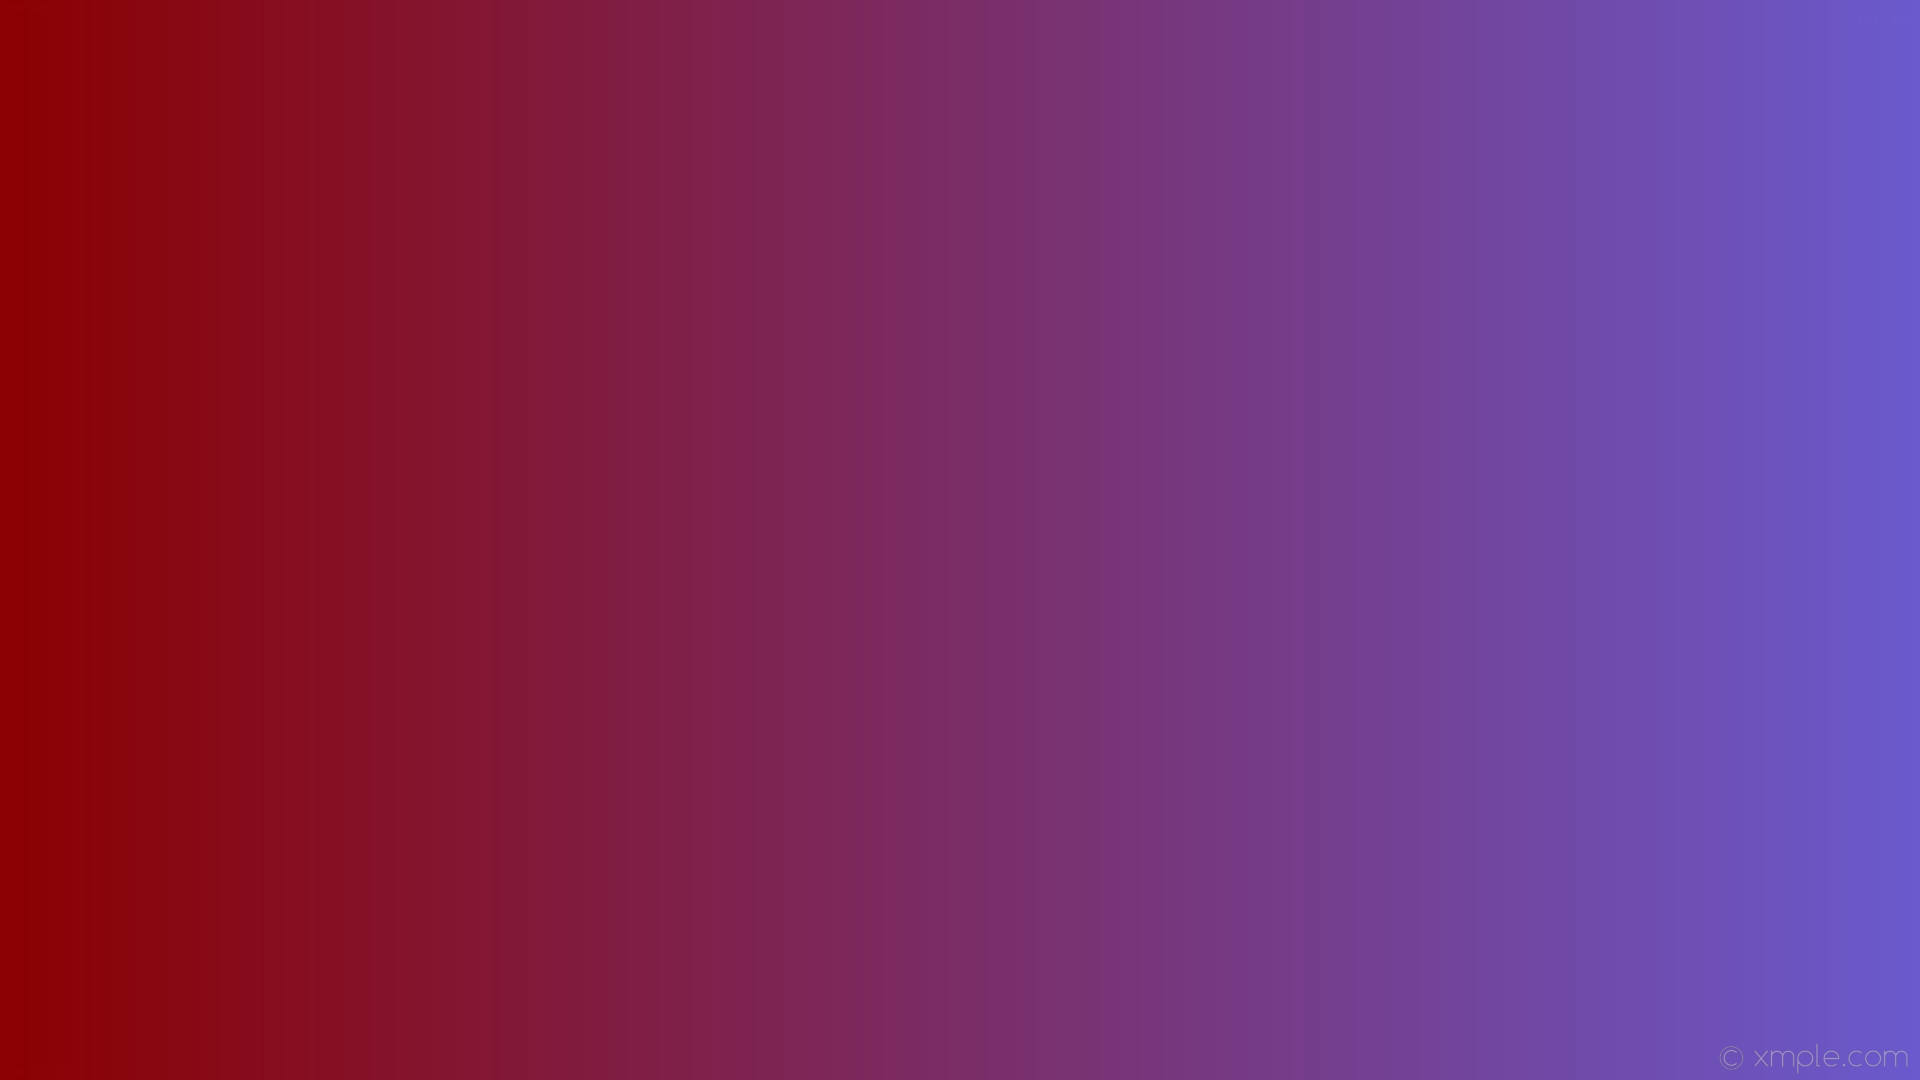 wallpaper gradient purple red linear slate blue dark red #6a5acd #8b0000 0°